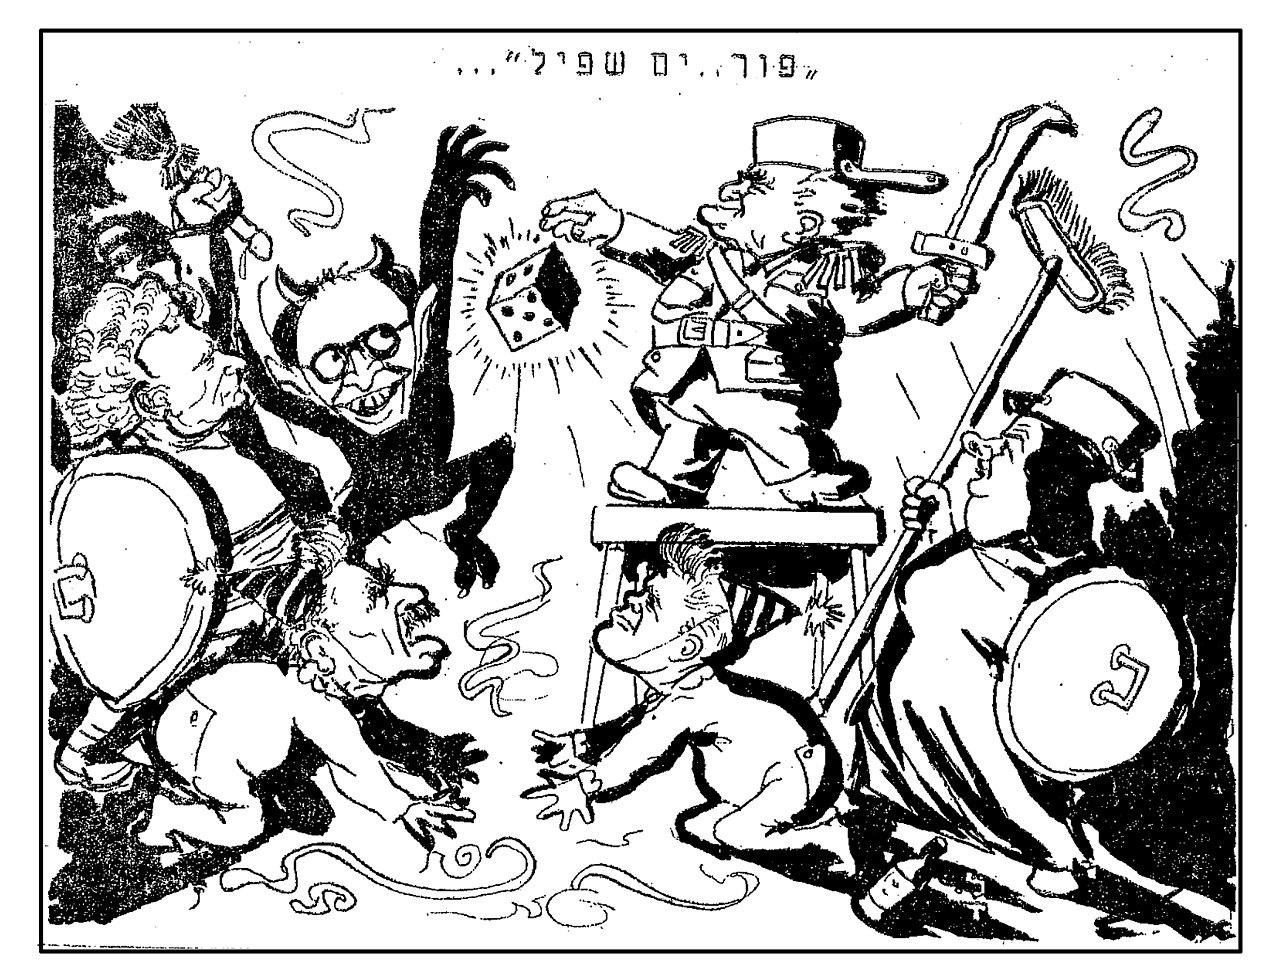 megilat-ester-karikatur